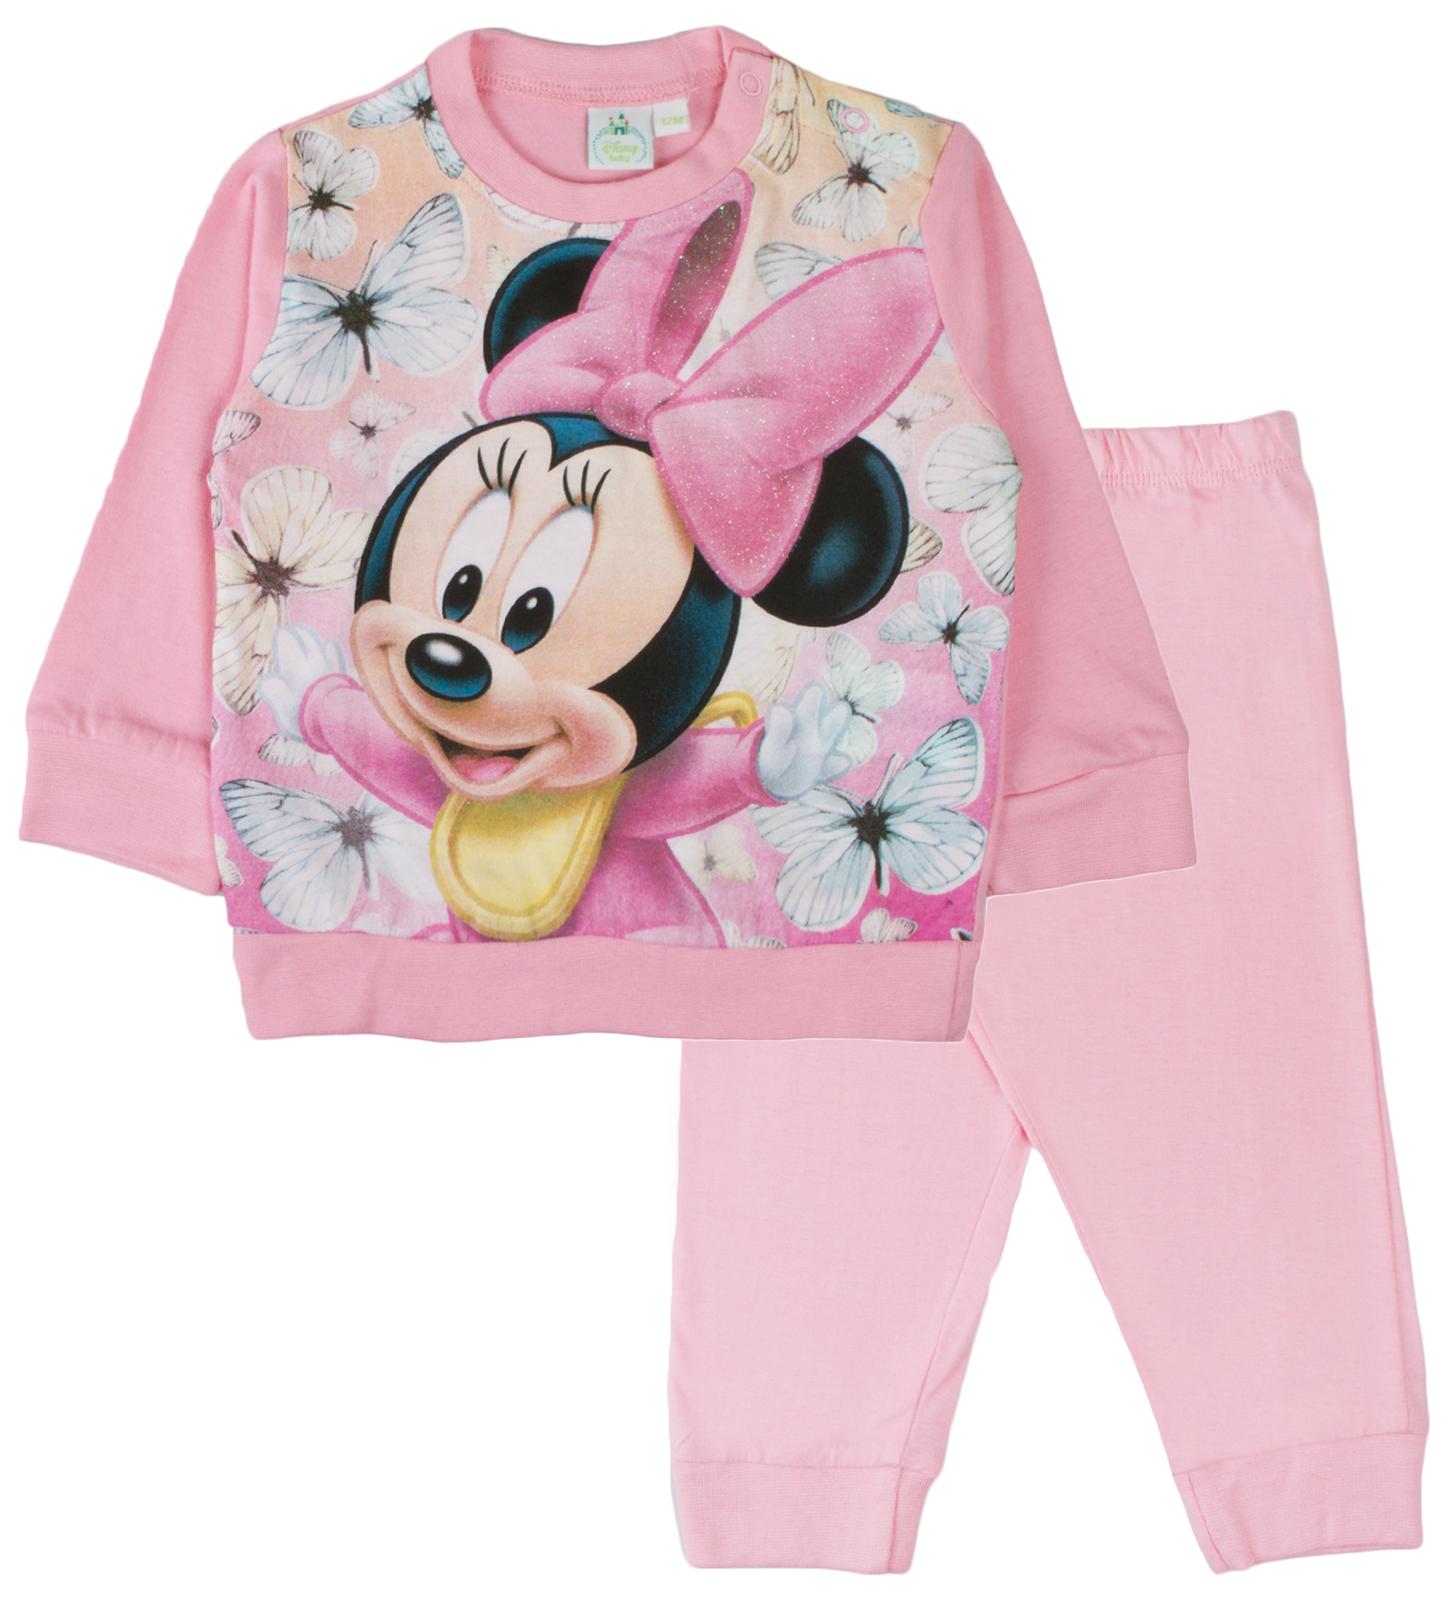 Filles Bébé Enfants Disney Officiel Minnie Mouse Pyjamas Pyjama 6-24 mois NEUF